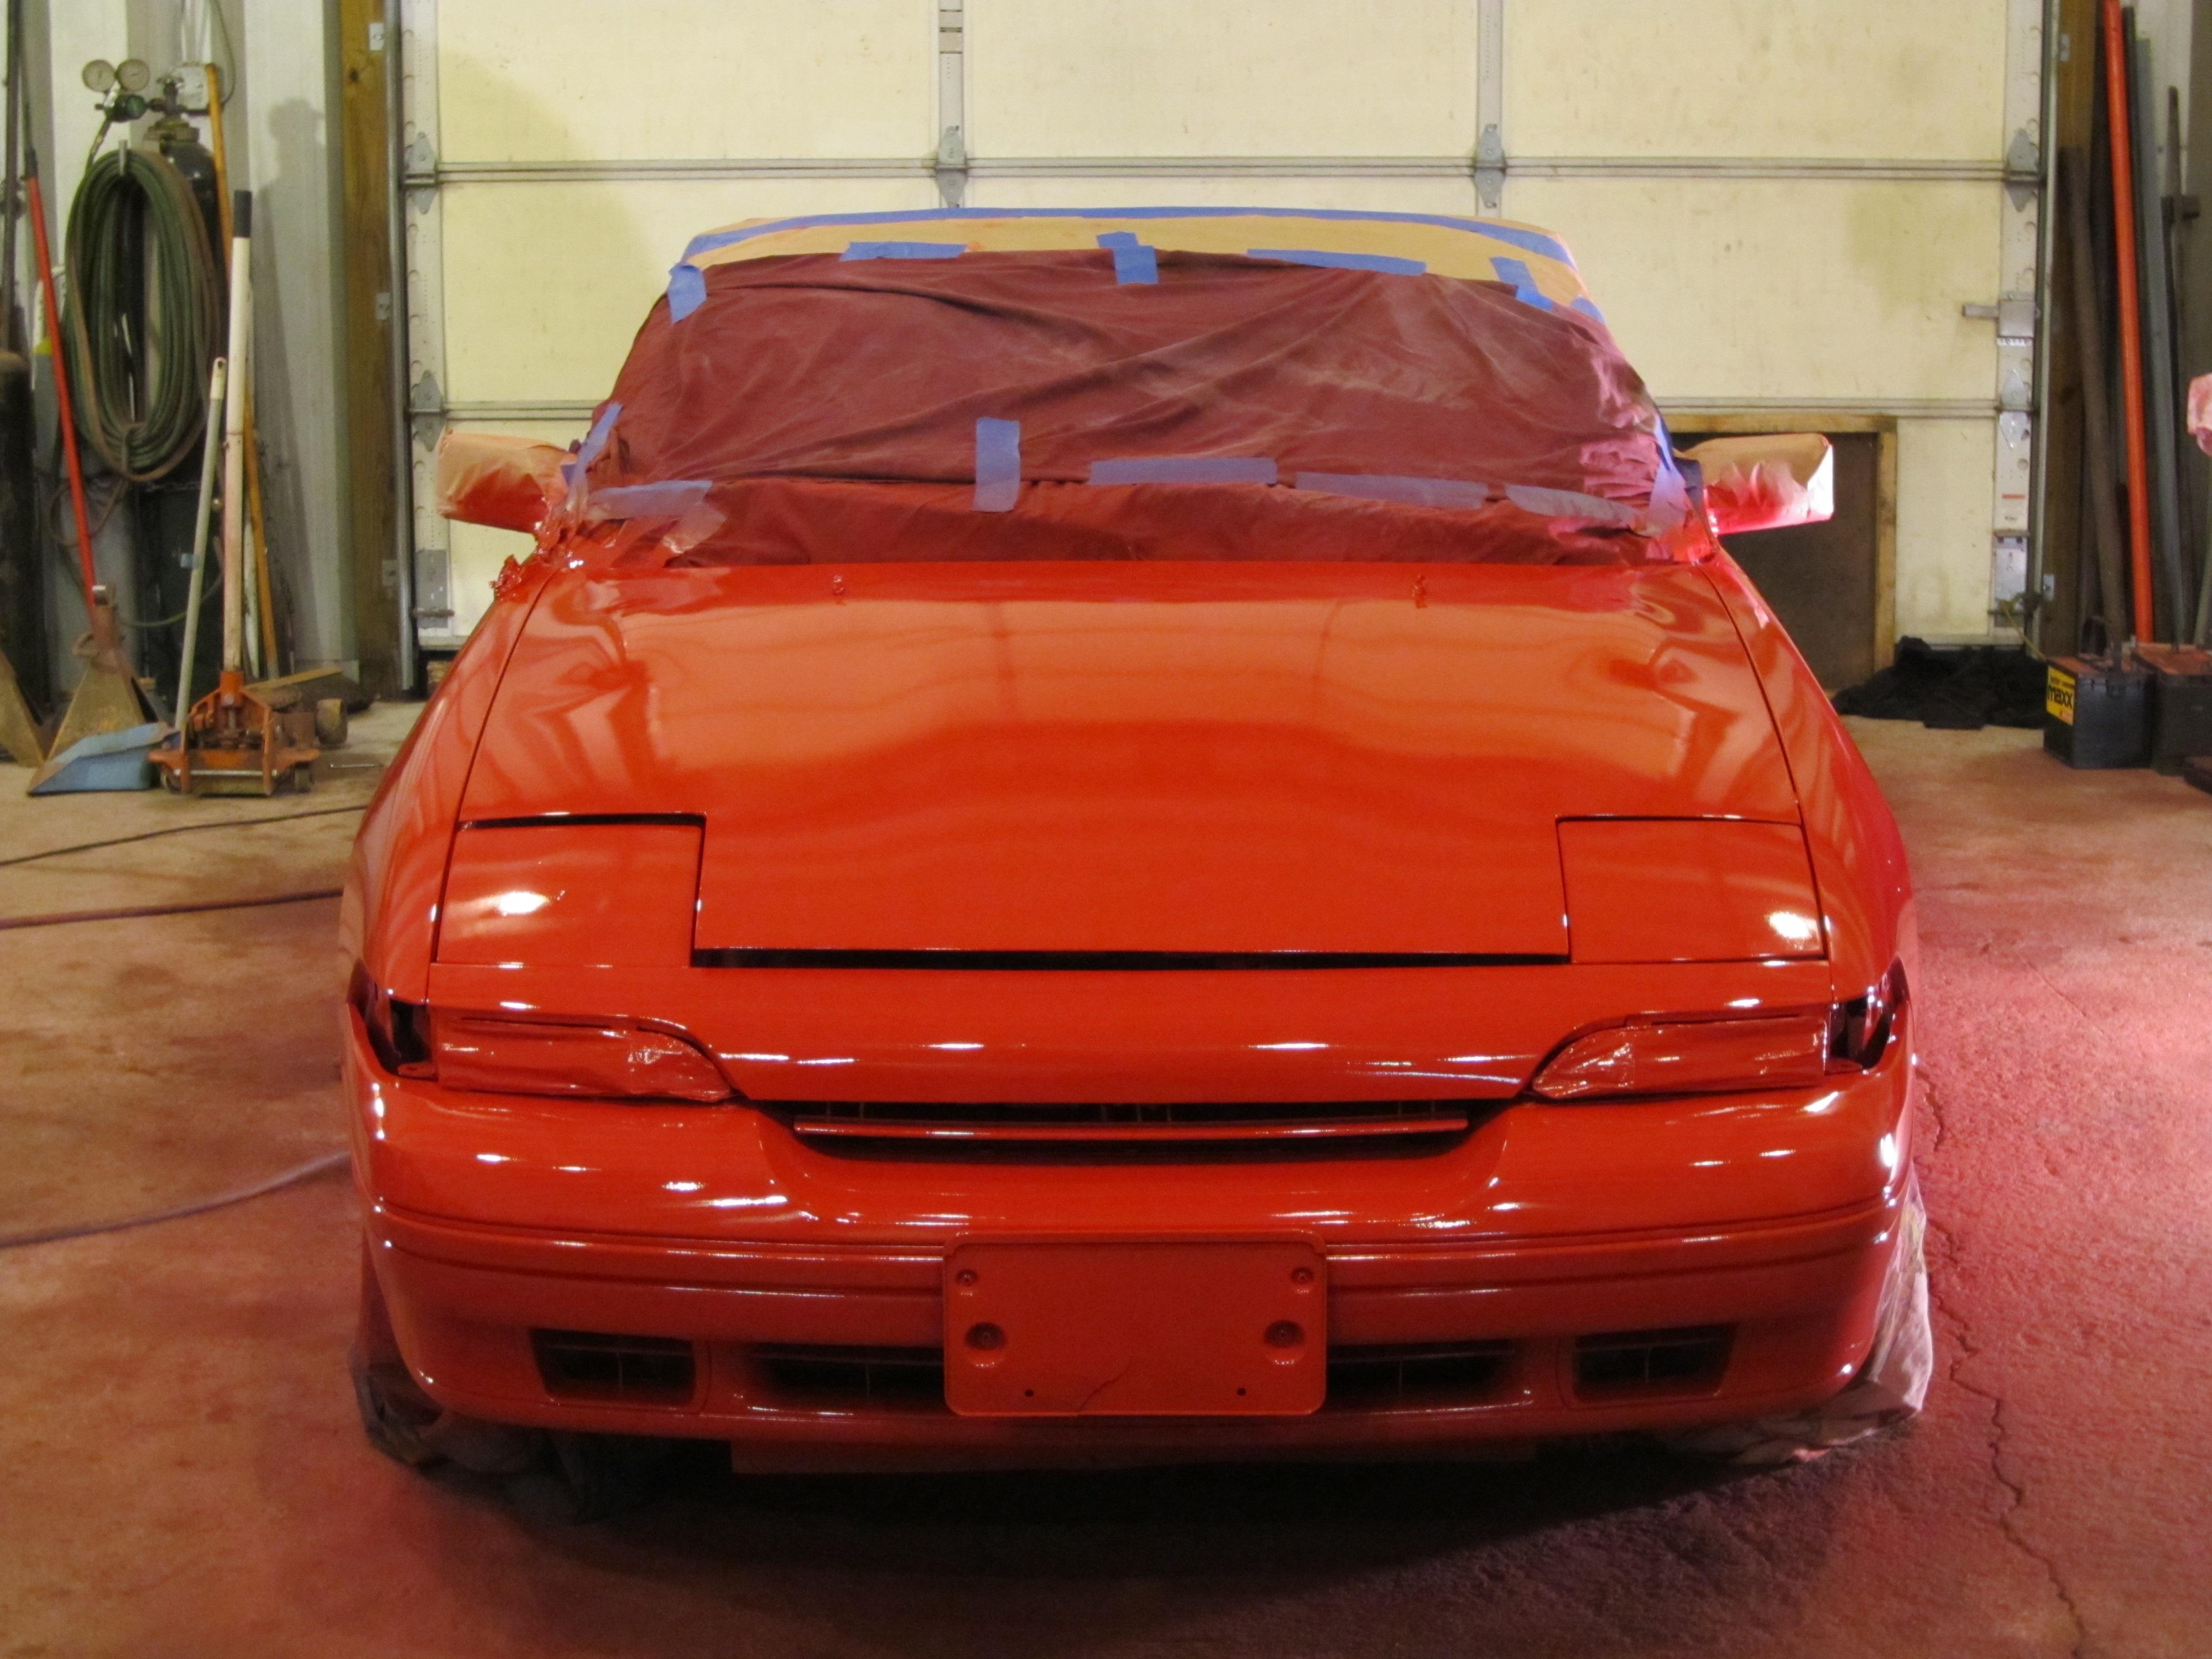 Free Images Work Repair Shop Paint Auto Garage Industry